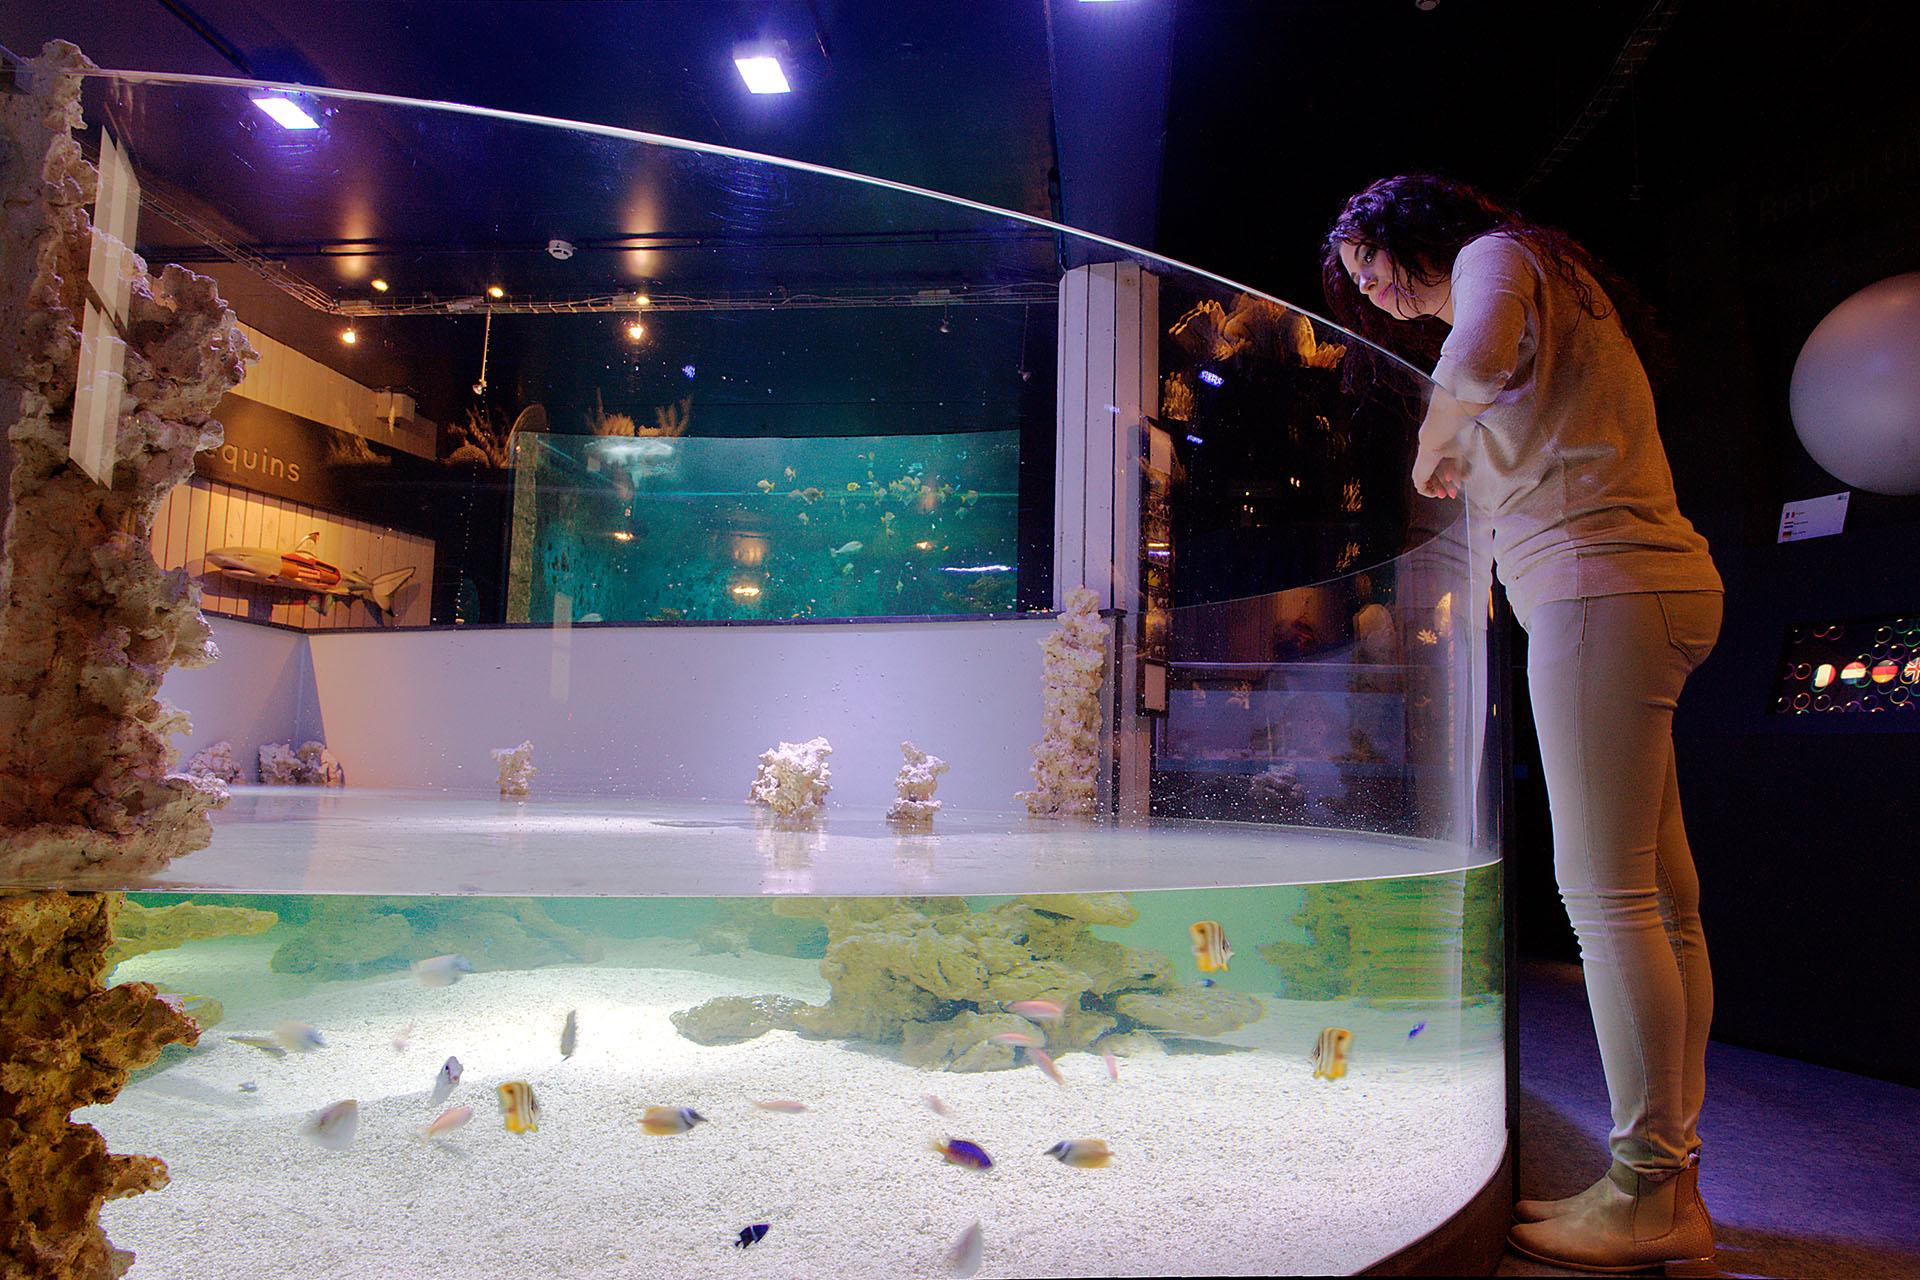 Aquarium - Muséum Universitaire de Liège